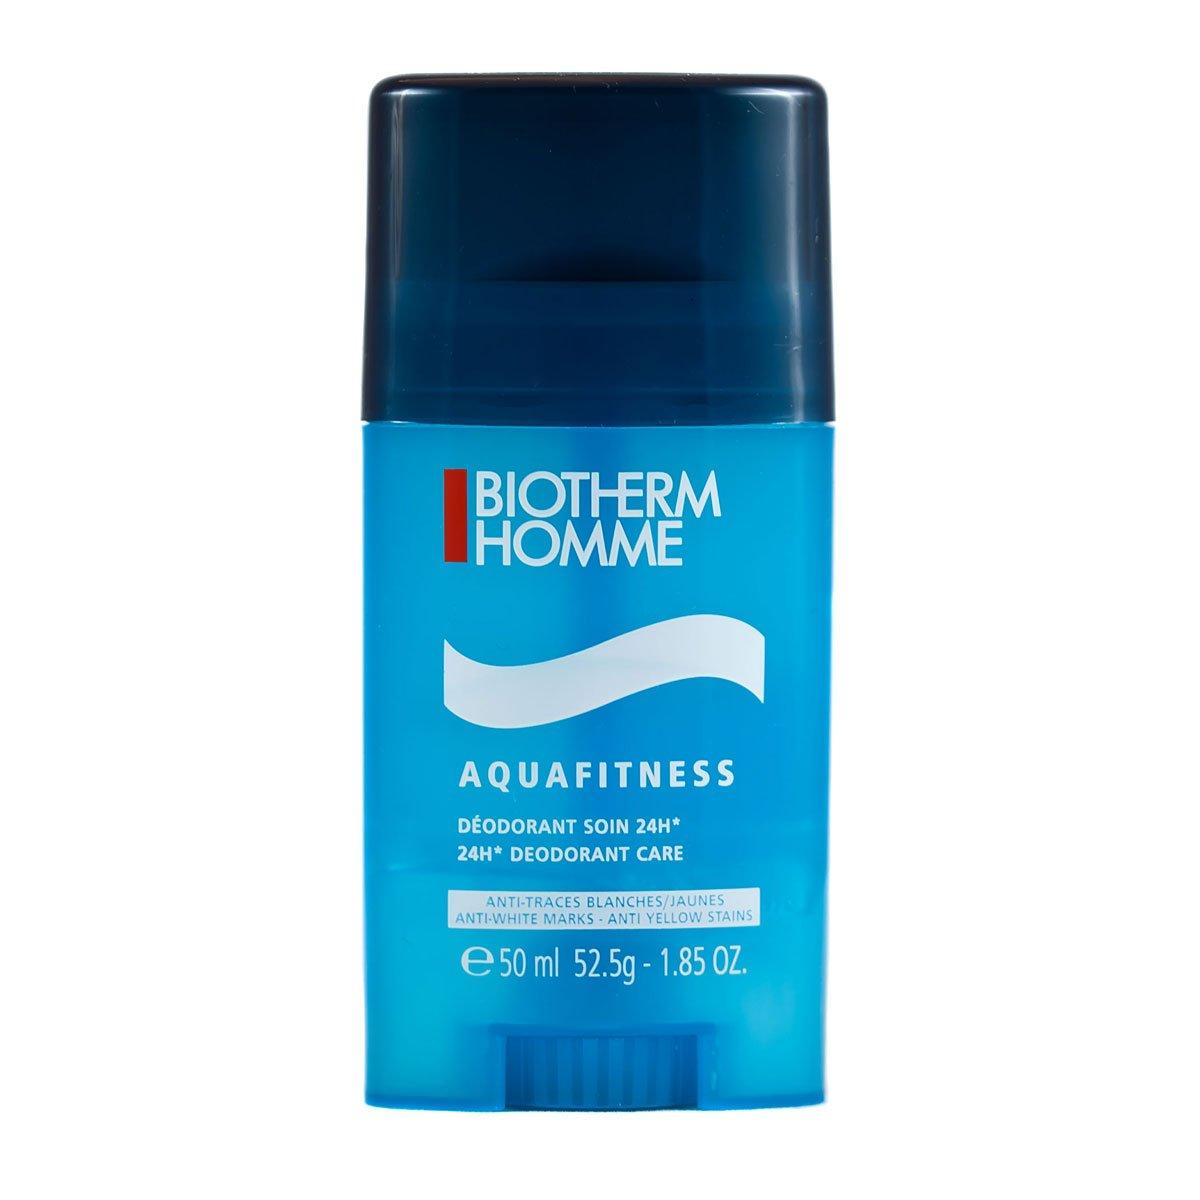 Biotherm Homme Aquafitness Desodorante Stick - 50 ml